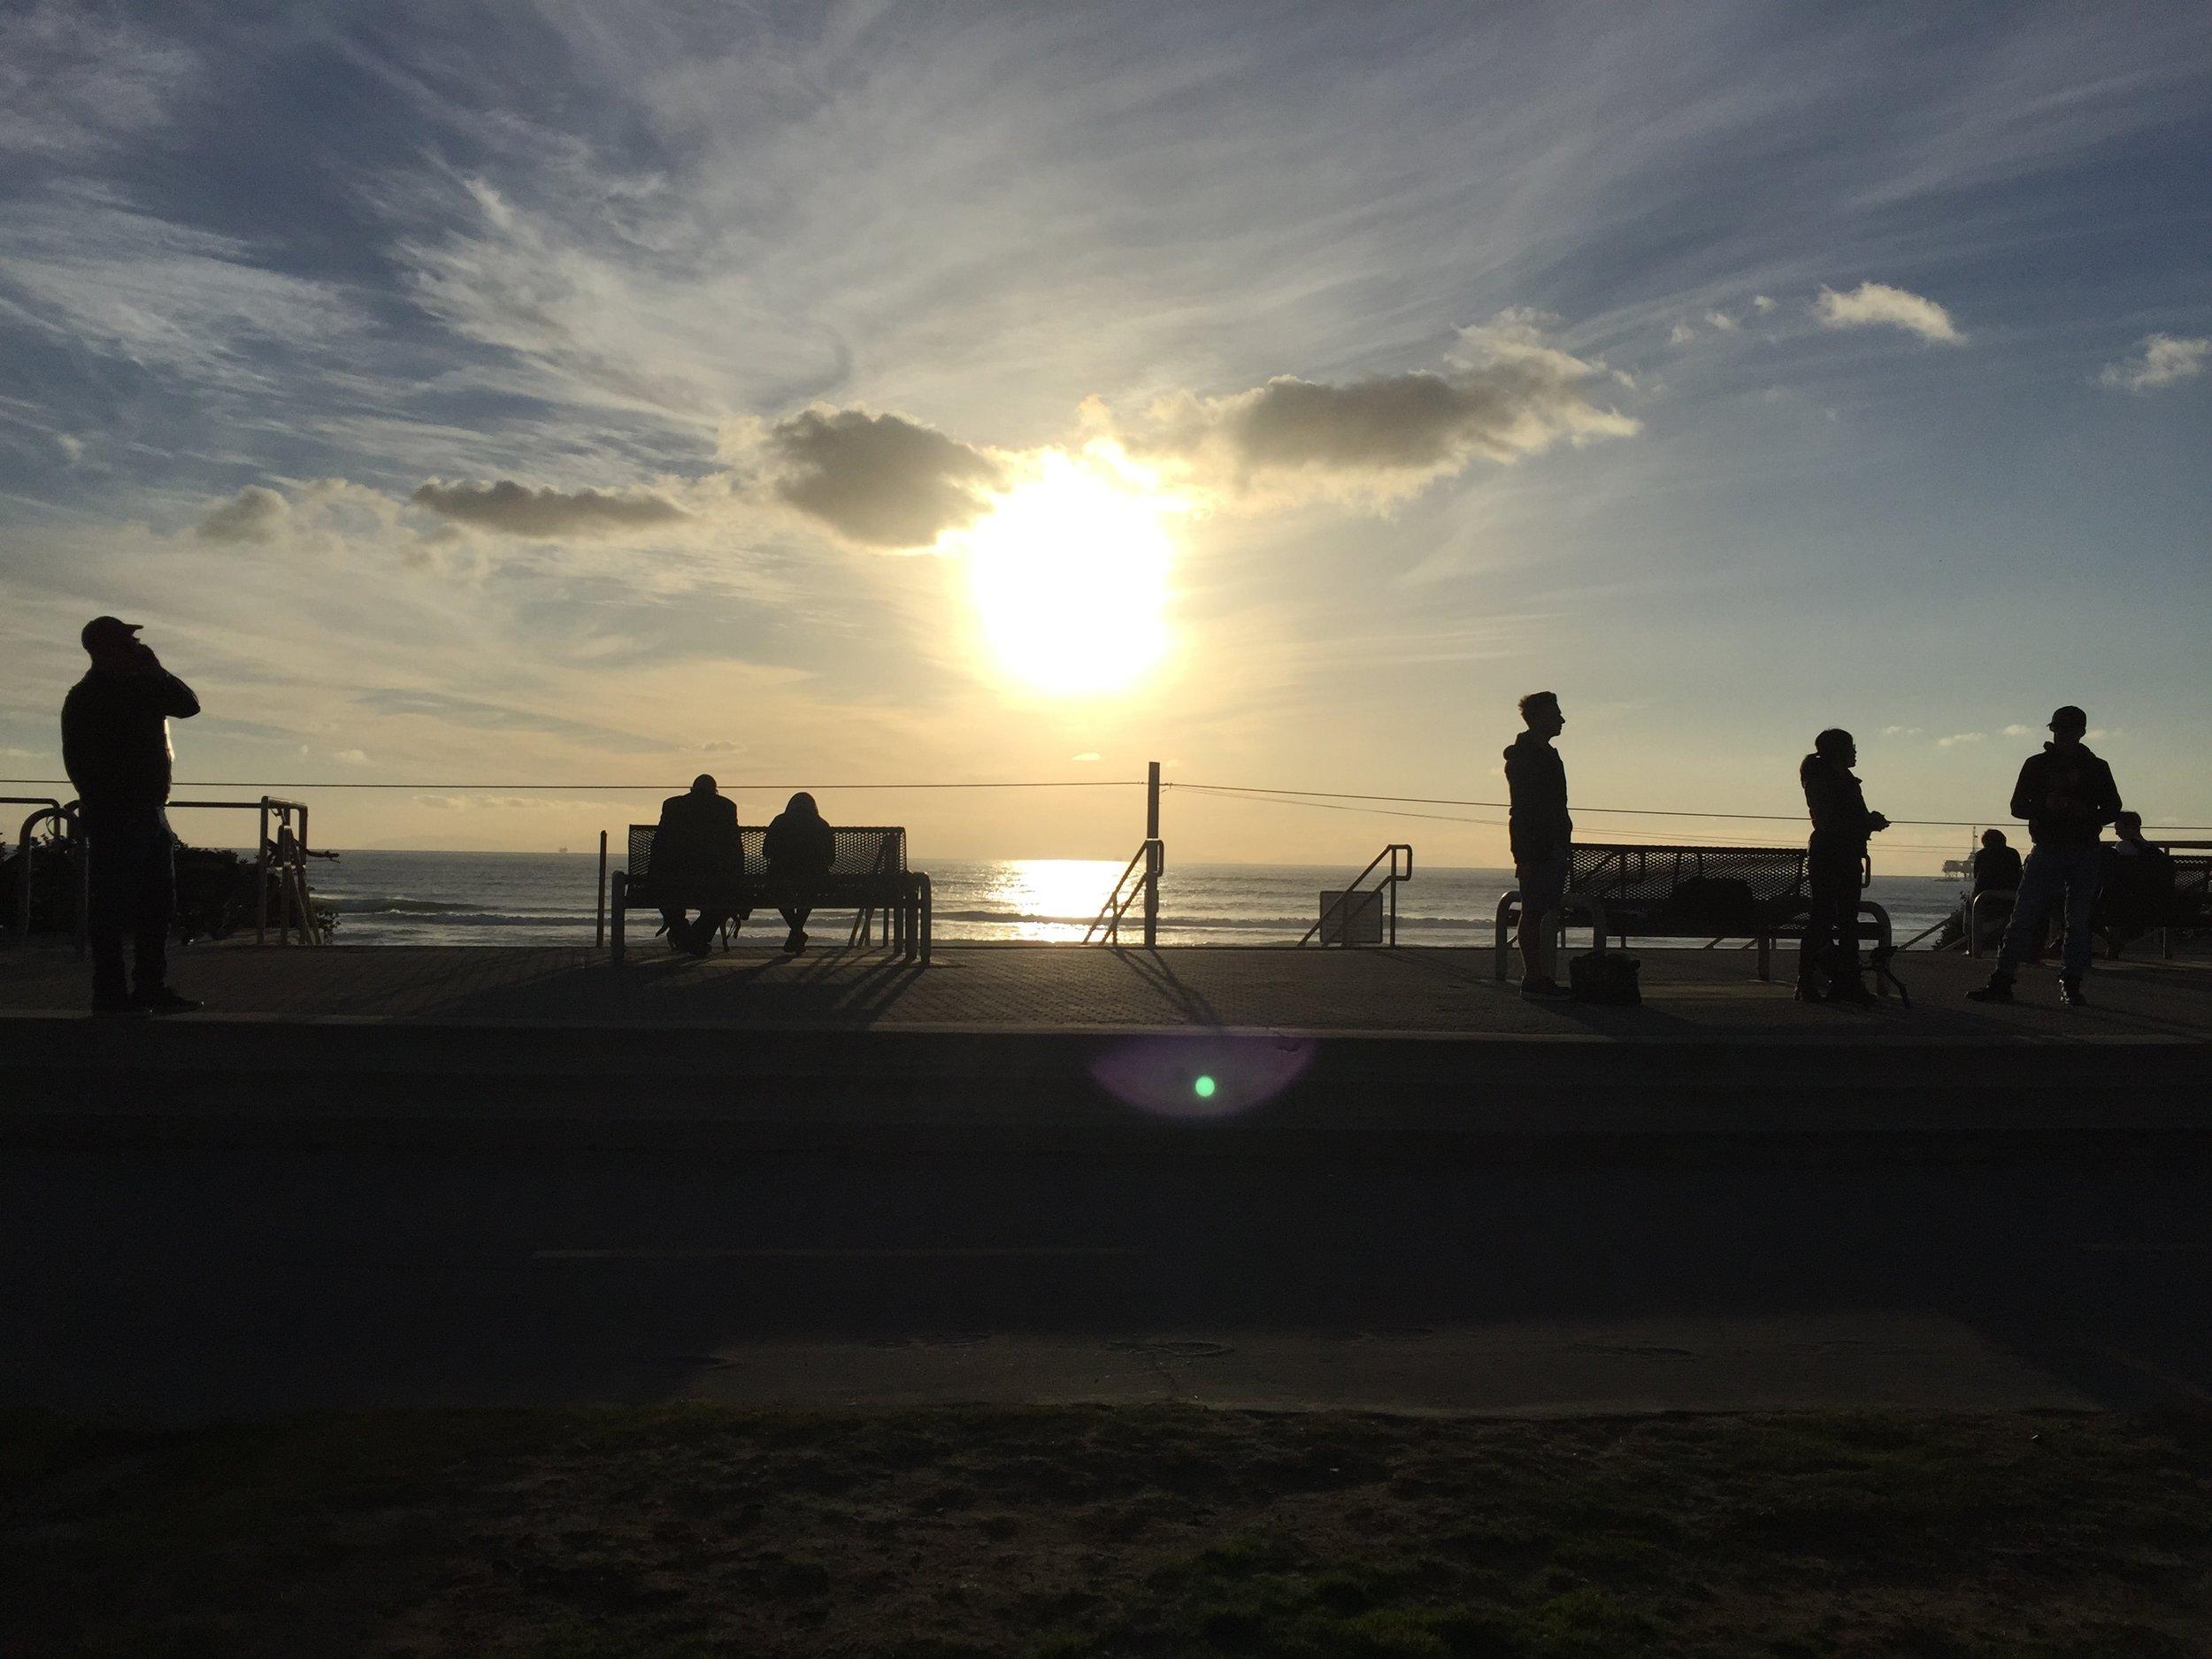 12/13/15 Sunset Beach Scene Scene. Huntington Beach, CA